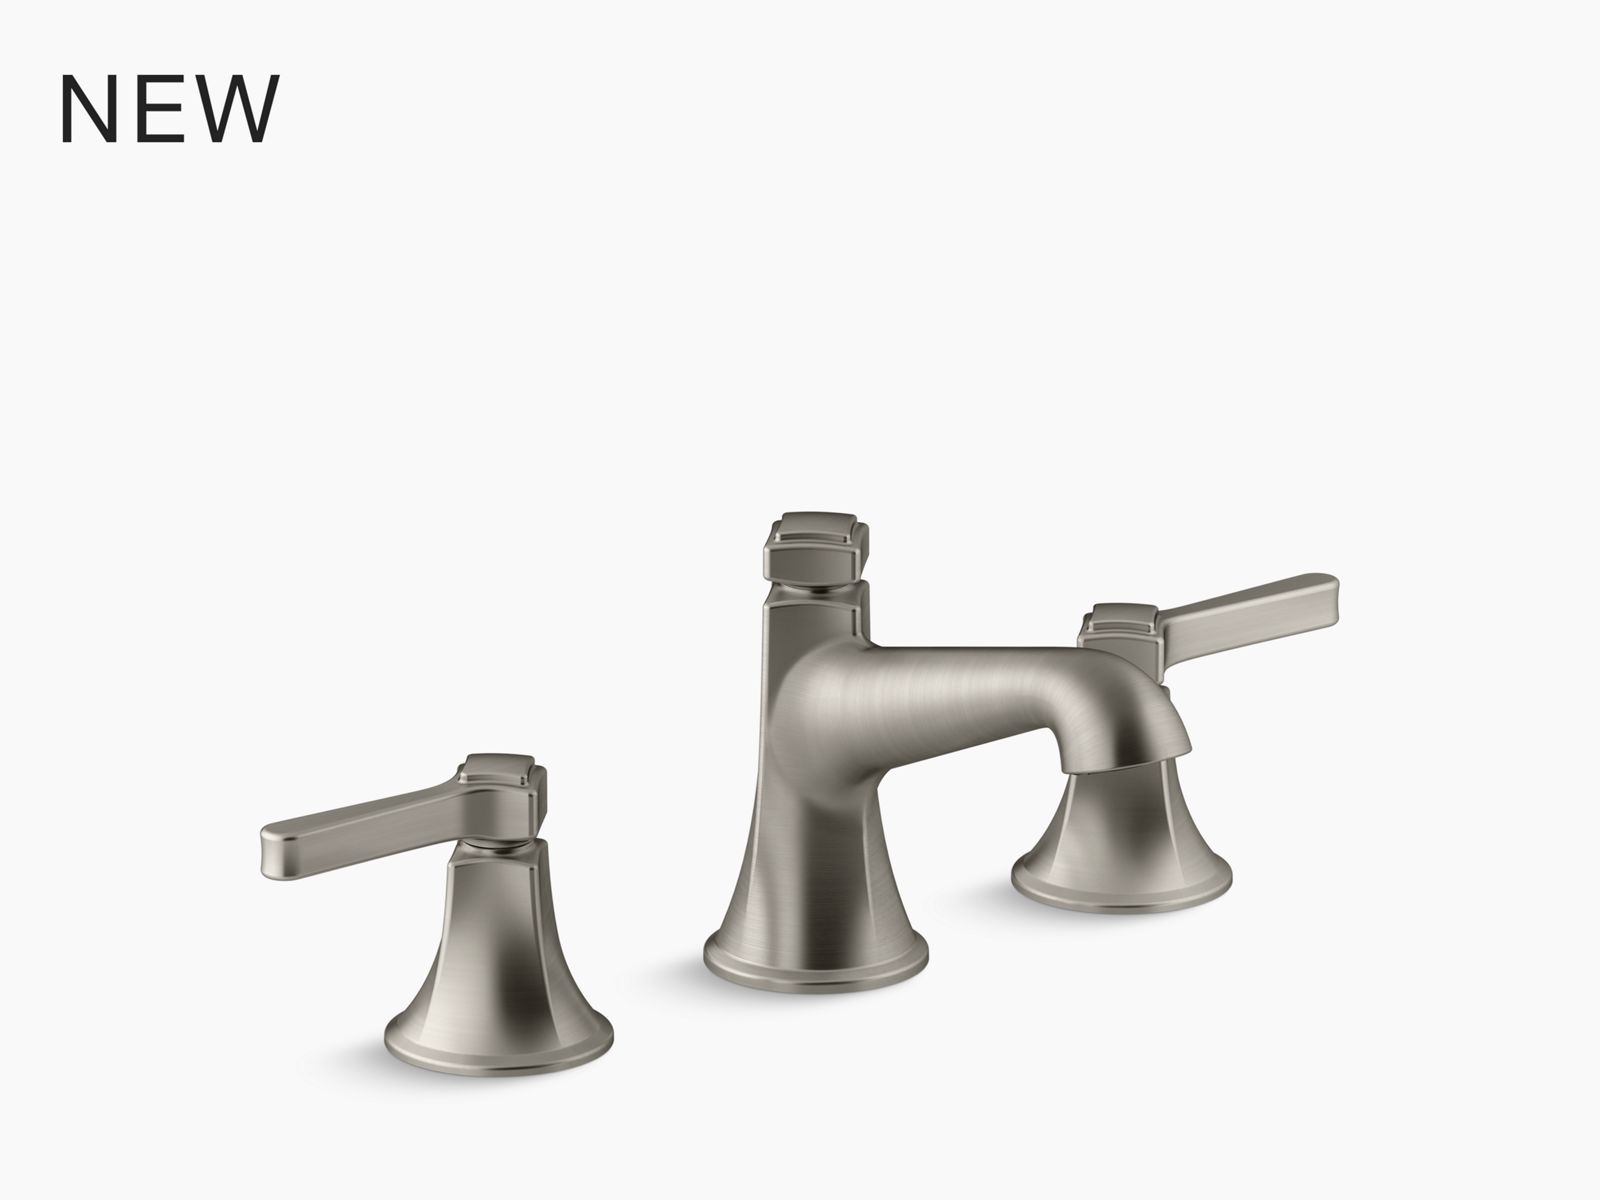 veer 21 pedestal bathroom sink with single faucet hole